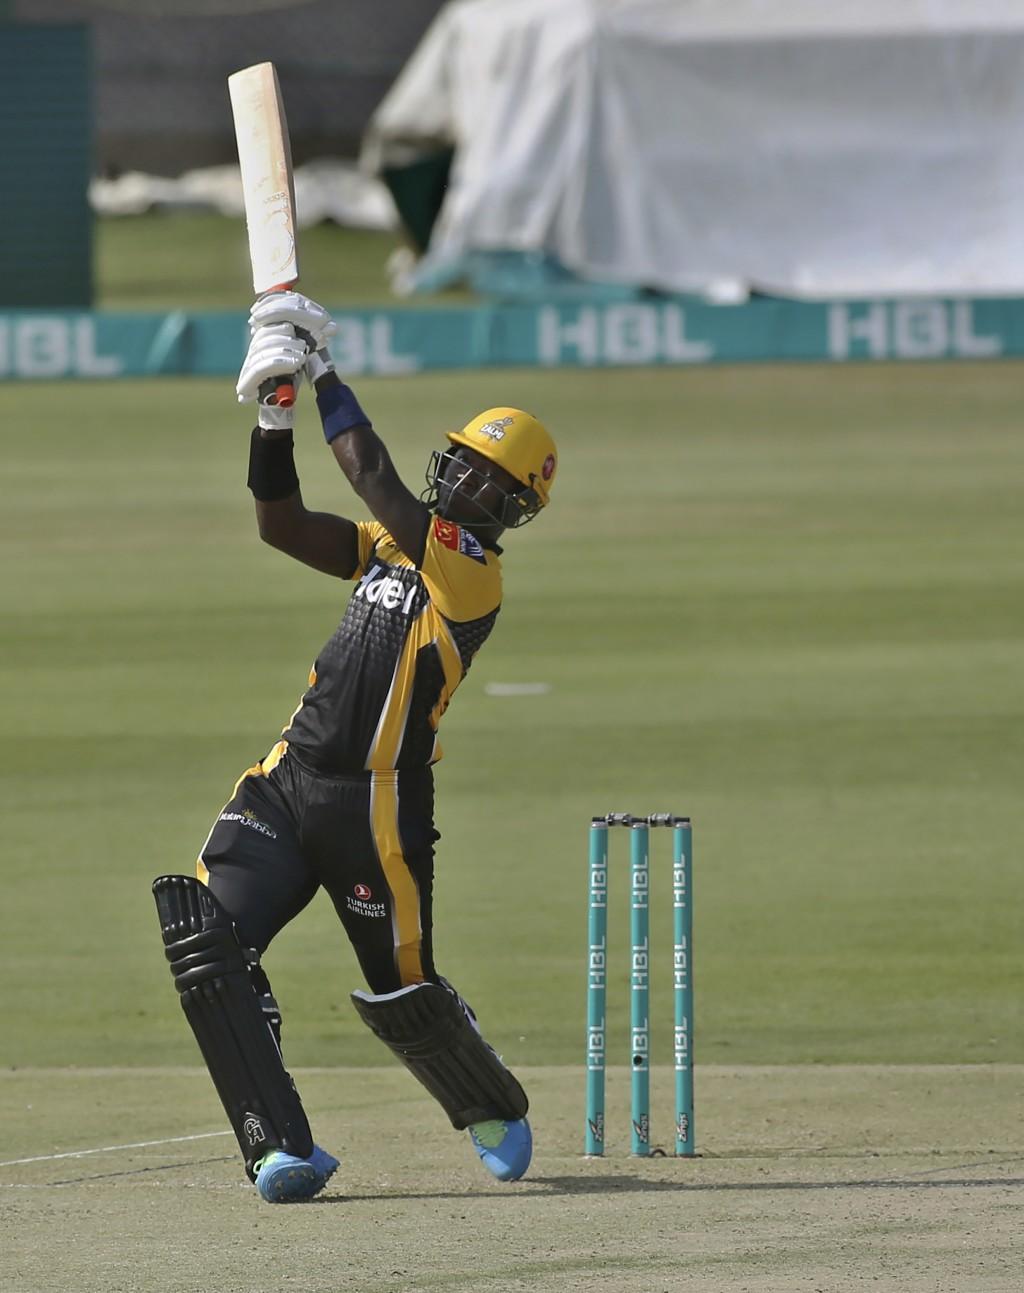 Peshawar Zalmi's Sherfane Rutherford plays a shot for boundary during a Pakistan Super League T20 cricket match between Peshawar Zalmi and Lahore Qala...